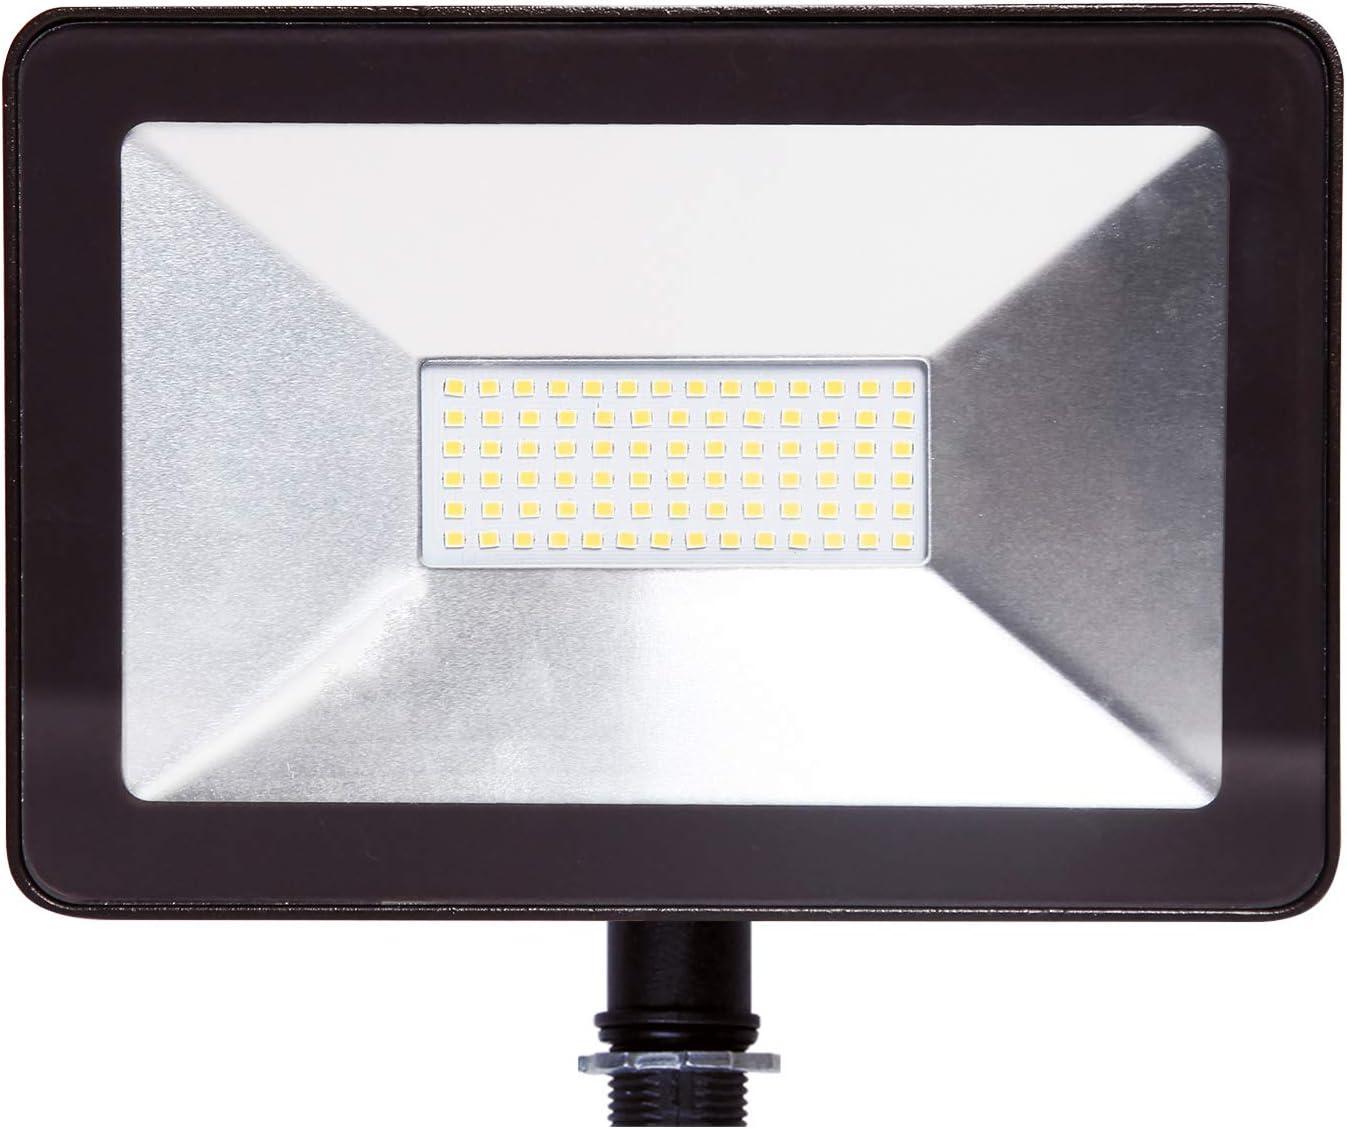 ASD 50W LED Flood Light Outdoor with Arm Mount – 5000K Daylight 5133lm SMD – Super Bright Light Waterproof for Garage Yard Garden Landscape – Super Slim – ETL Listed DLC – Bronze